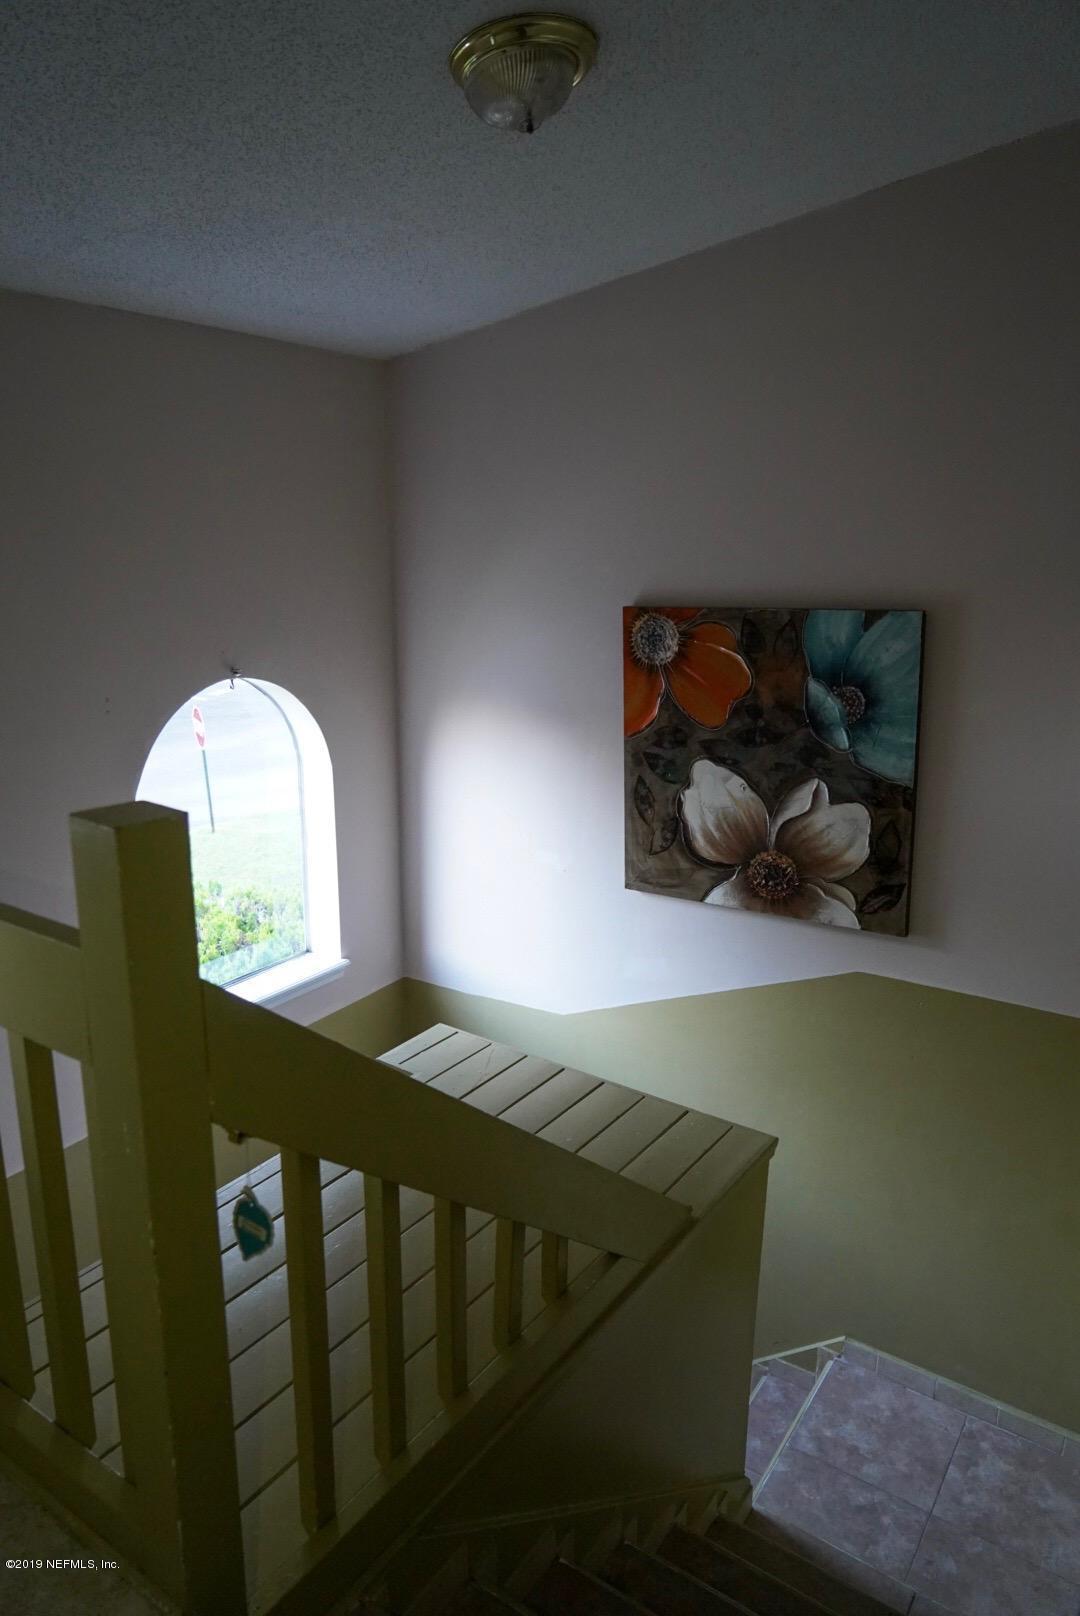 3270 RICKY- JACKSONVILLE- FLORIDA 32223, 2 Bedrooms Bedrooms, ,2 BathroomsBathrooms,Condo,For sale,RICKY,1014651